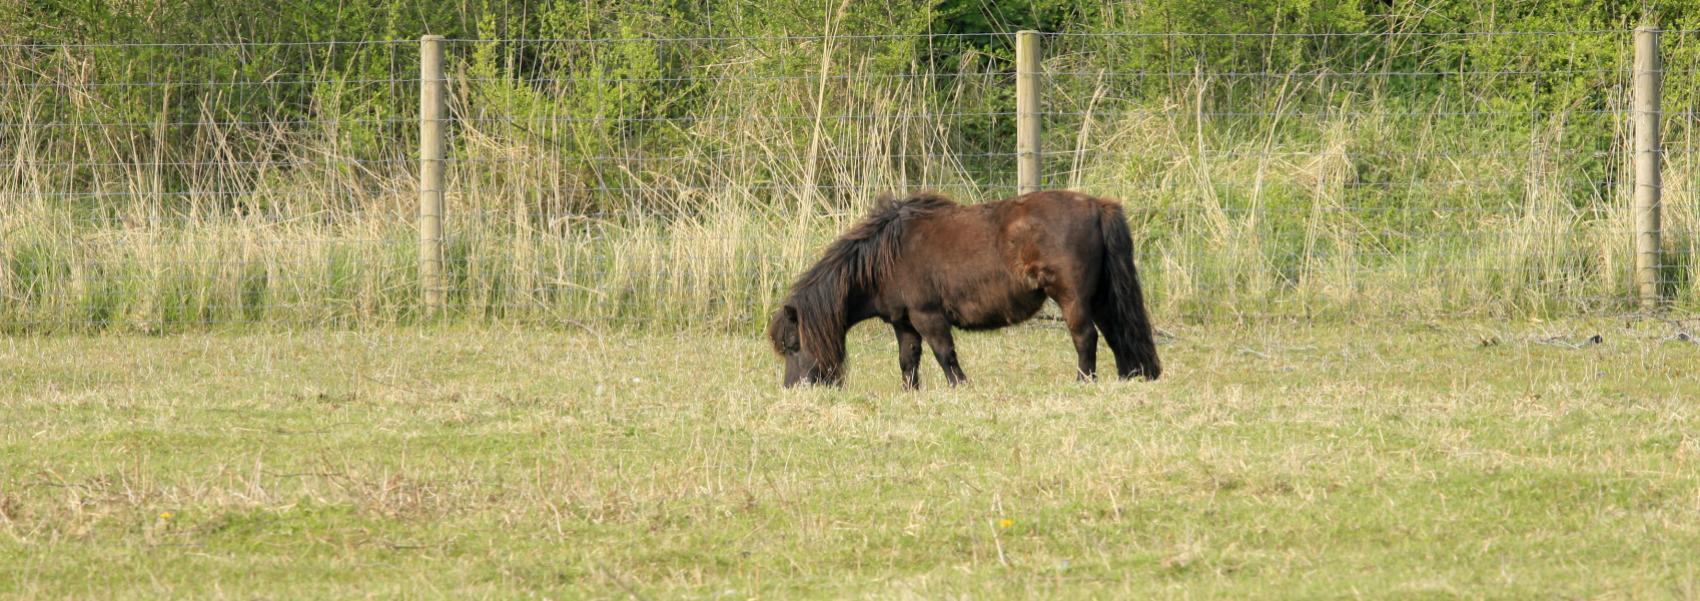 grazende pony